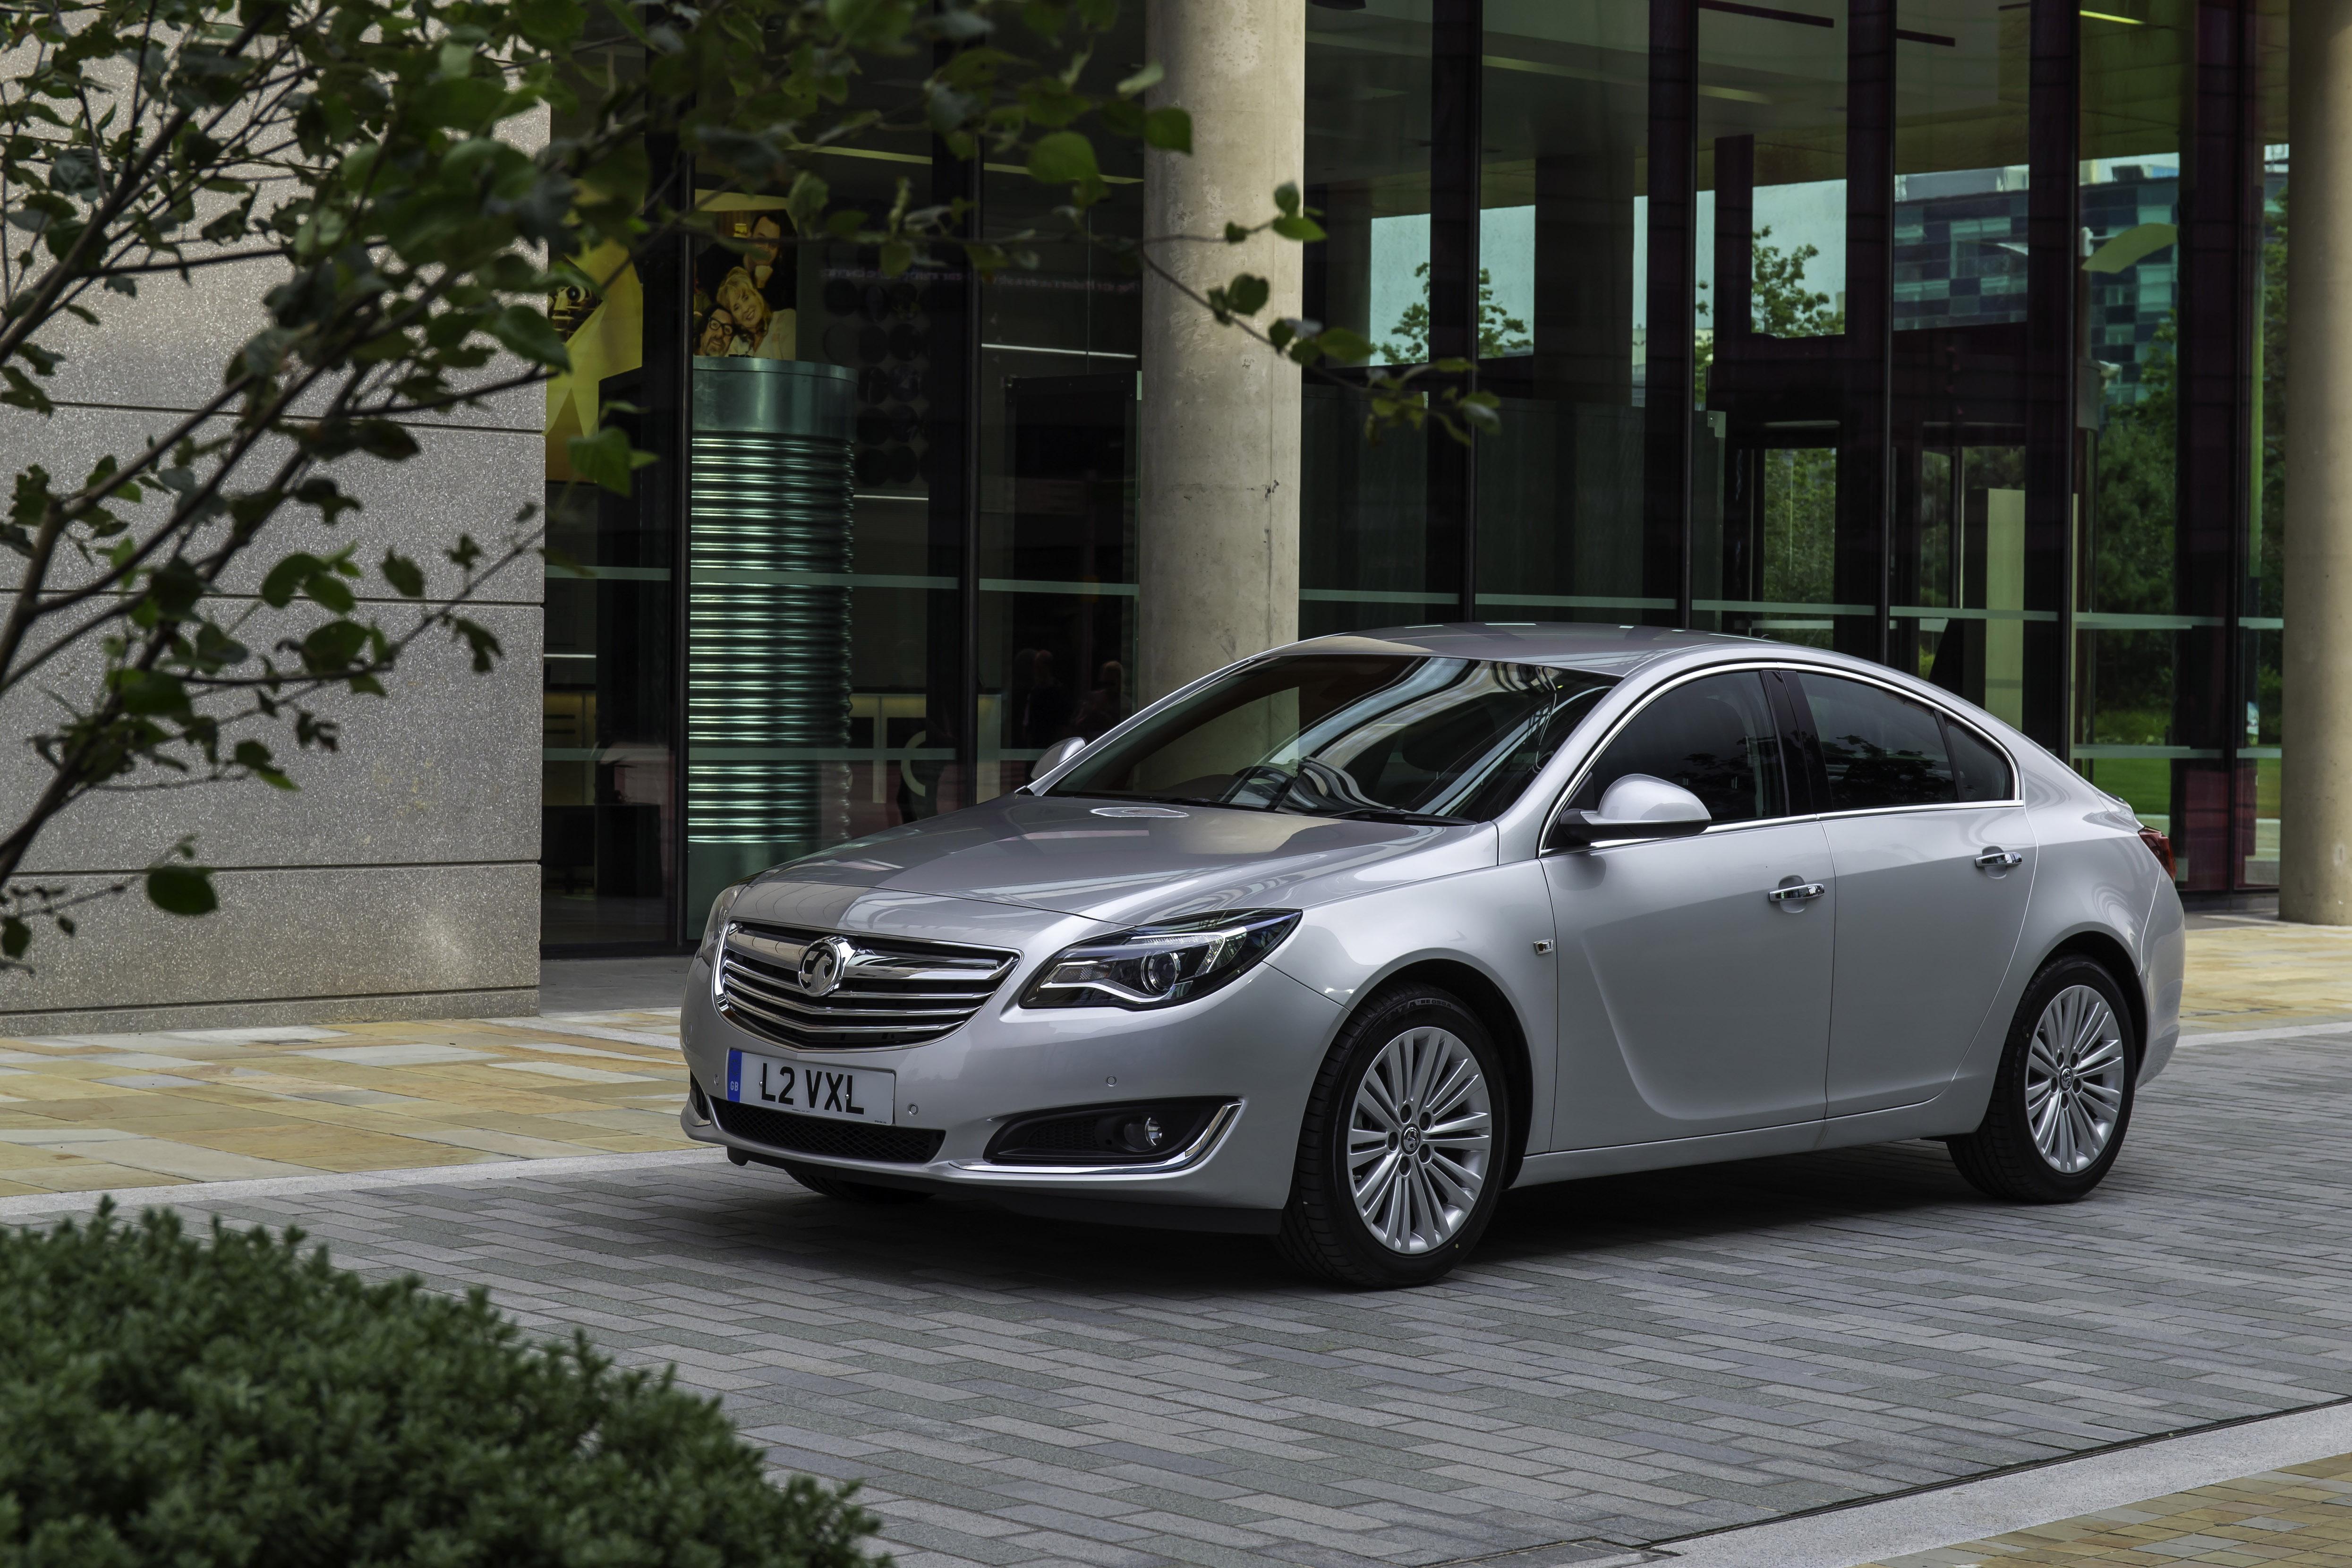 Vauxhall Insignia 1 6 Sidi Elite First Drive